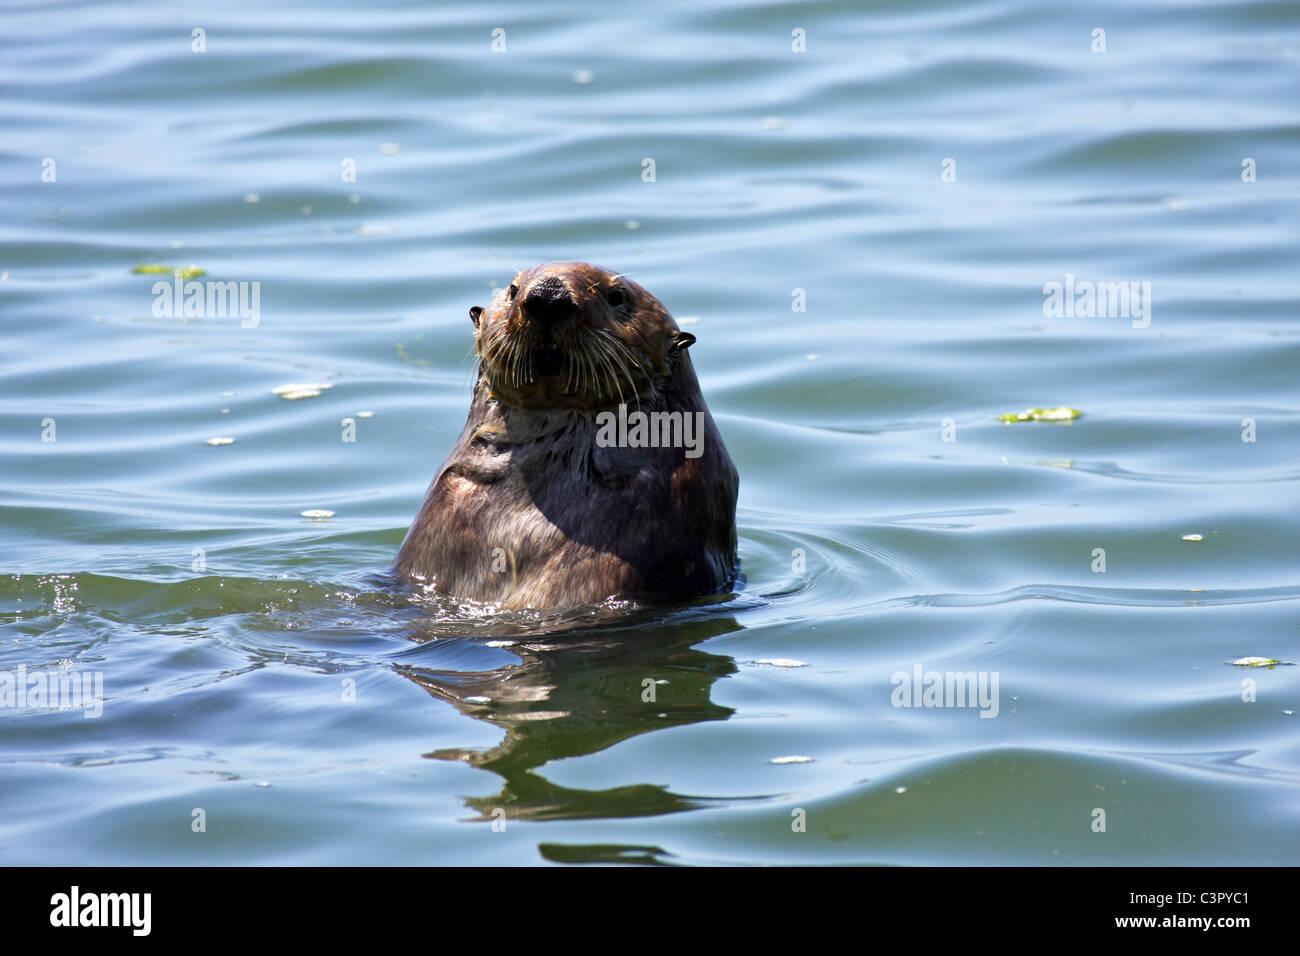 Sea Otter (Enhydra lutris) - Moss Landing, California, , Elkhorn Slough National Estuarine Research Reserve - Stock Image